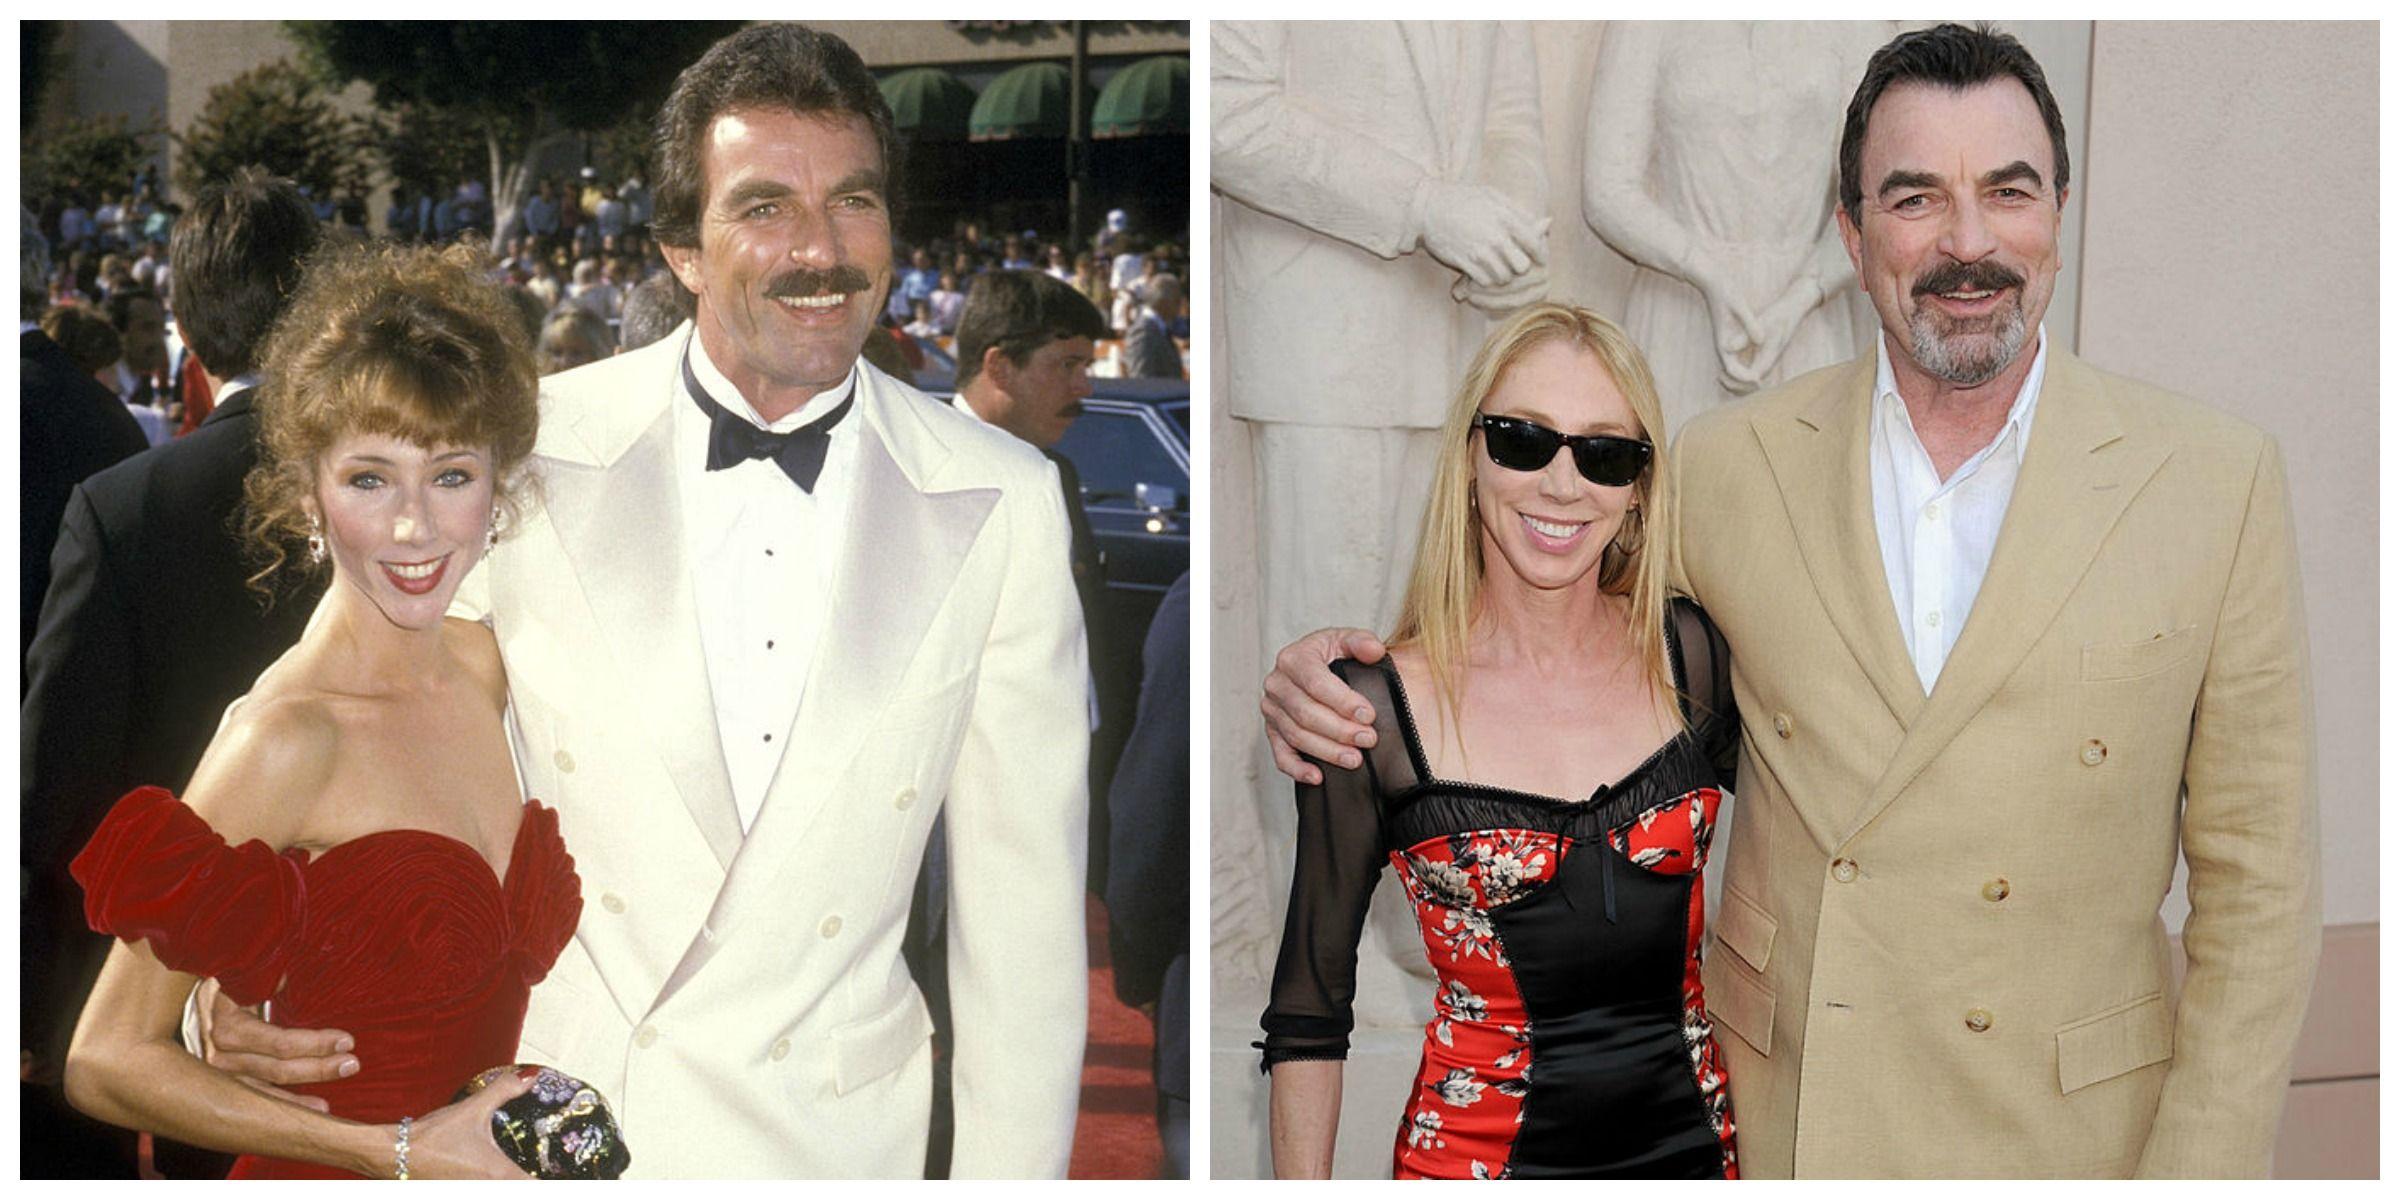 Tom Selleck and Jillie Mack married 30 years